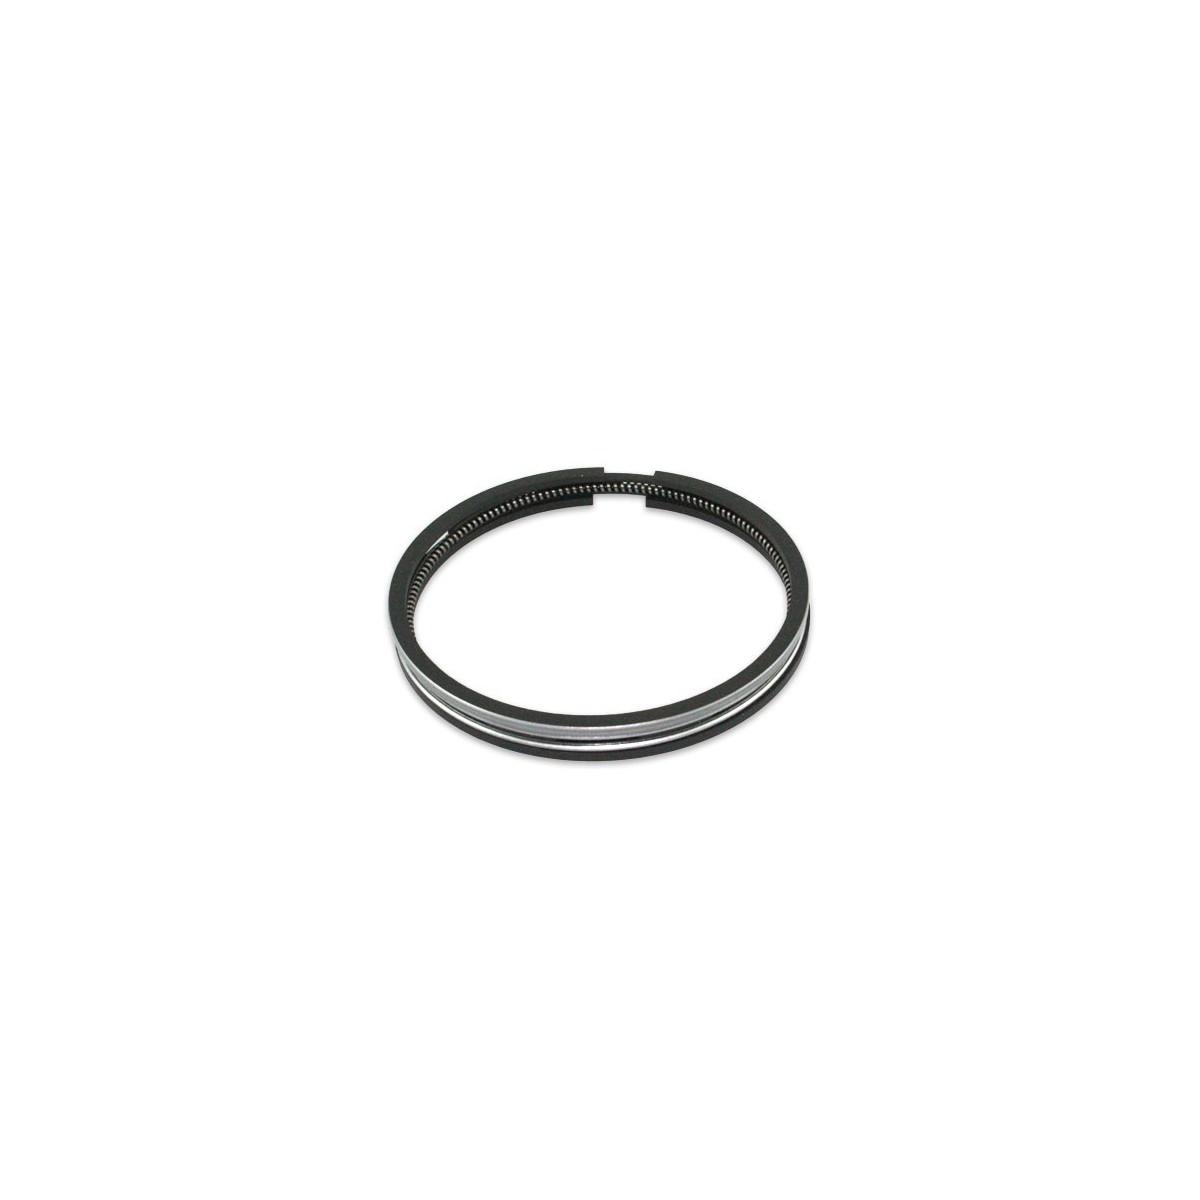 Piston Ring Set 75mm Hinomoto E1804 75 : 2 x 2 x 4 (74) STD